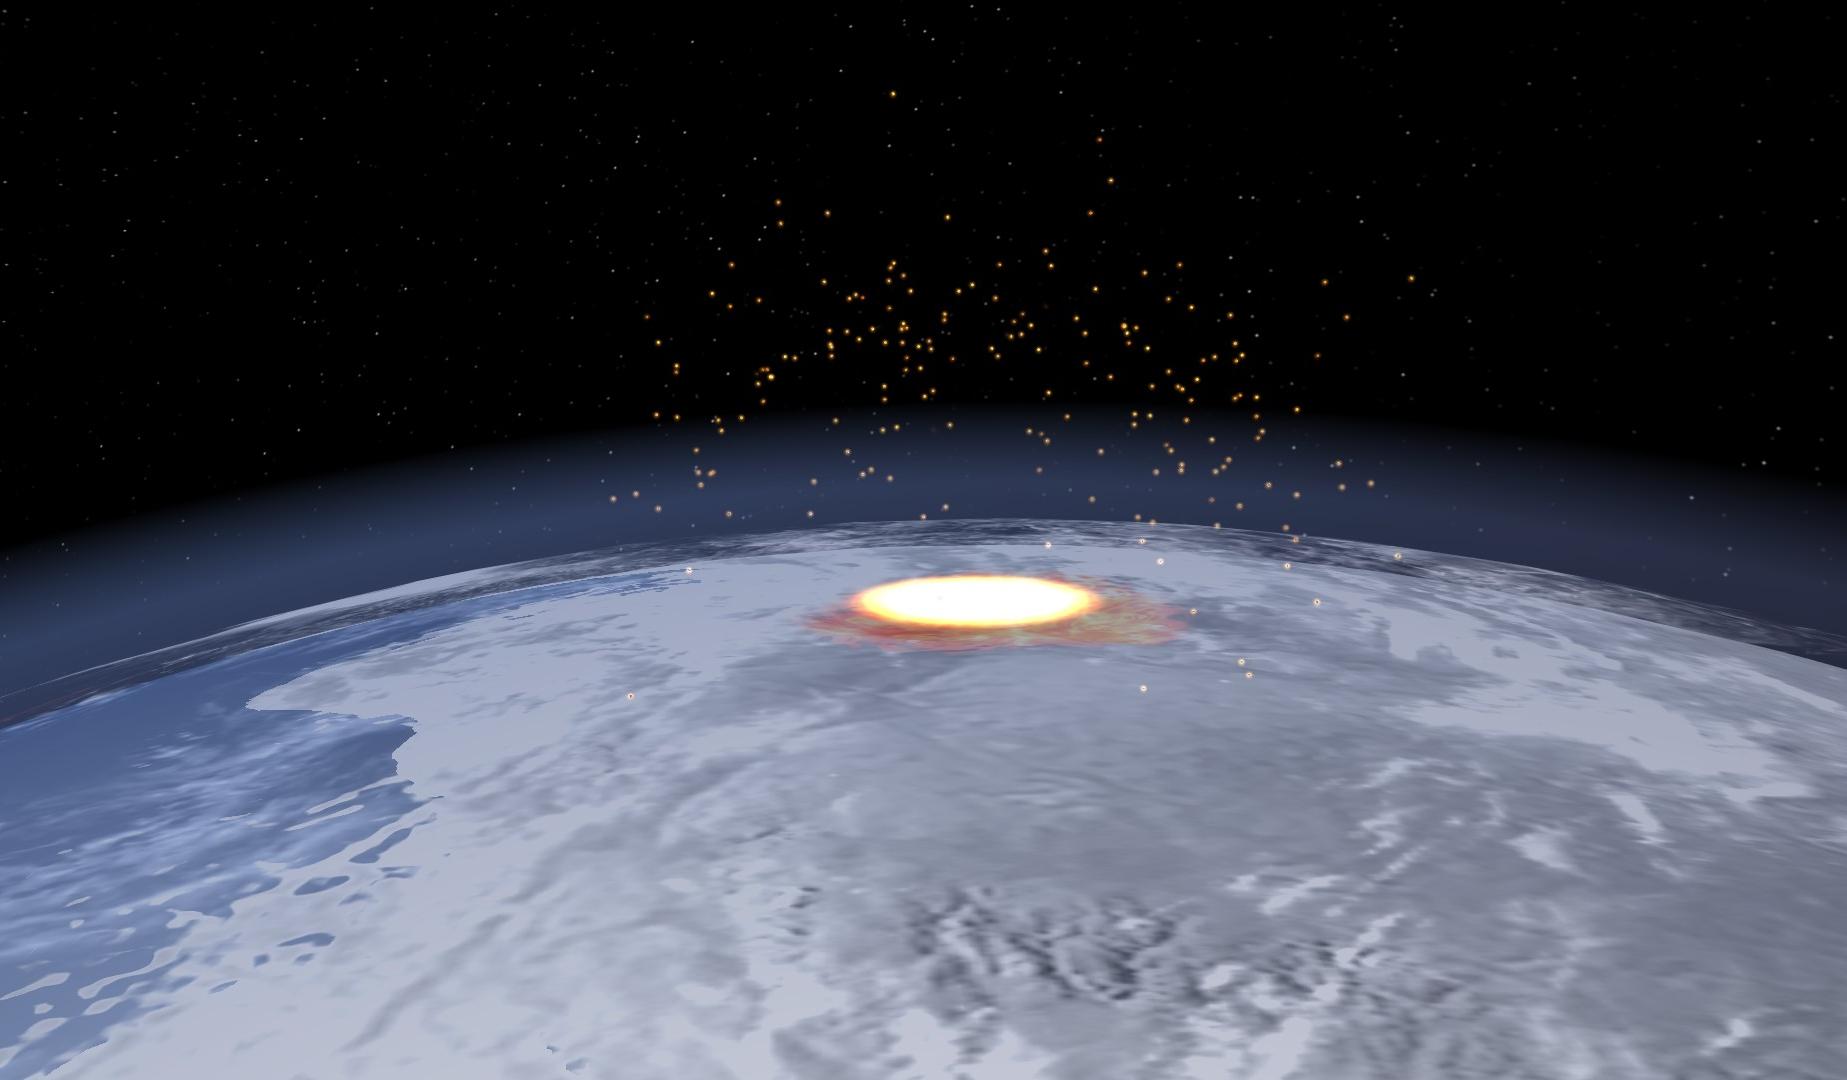 Hiawatha Crater Impact